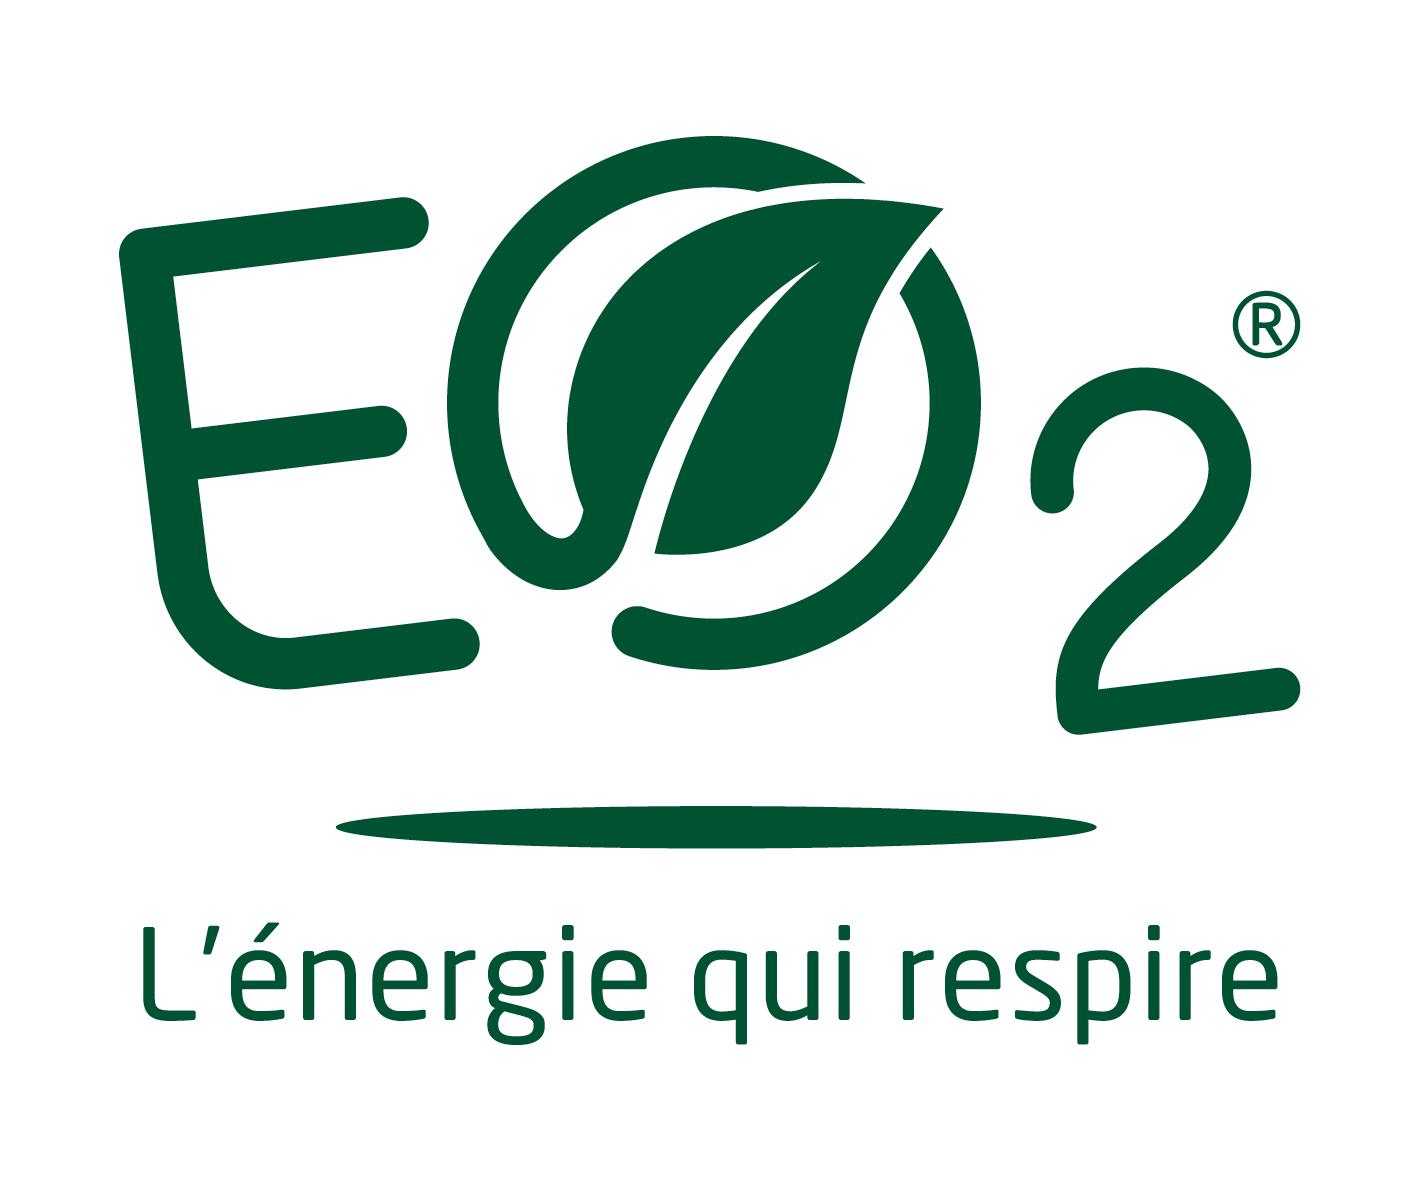 logo-eo2